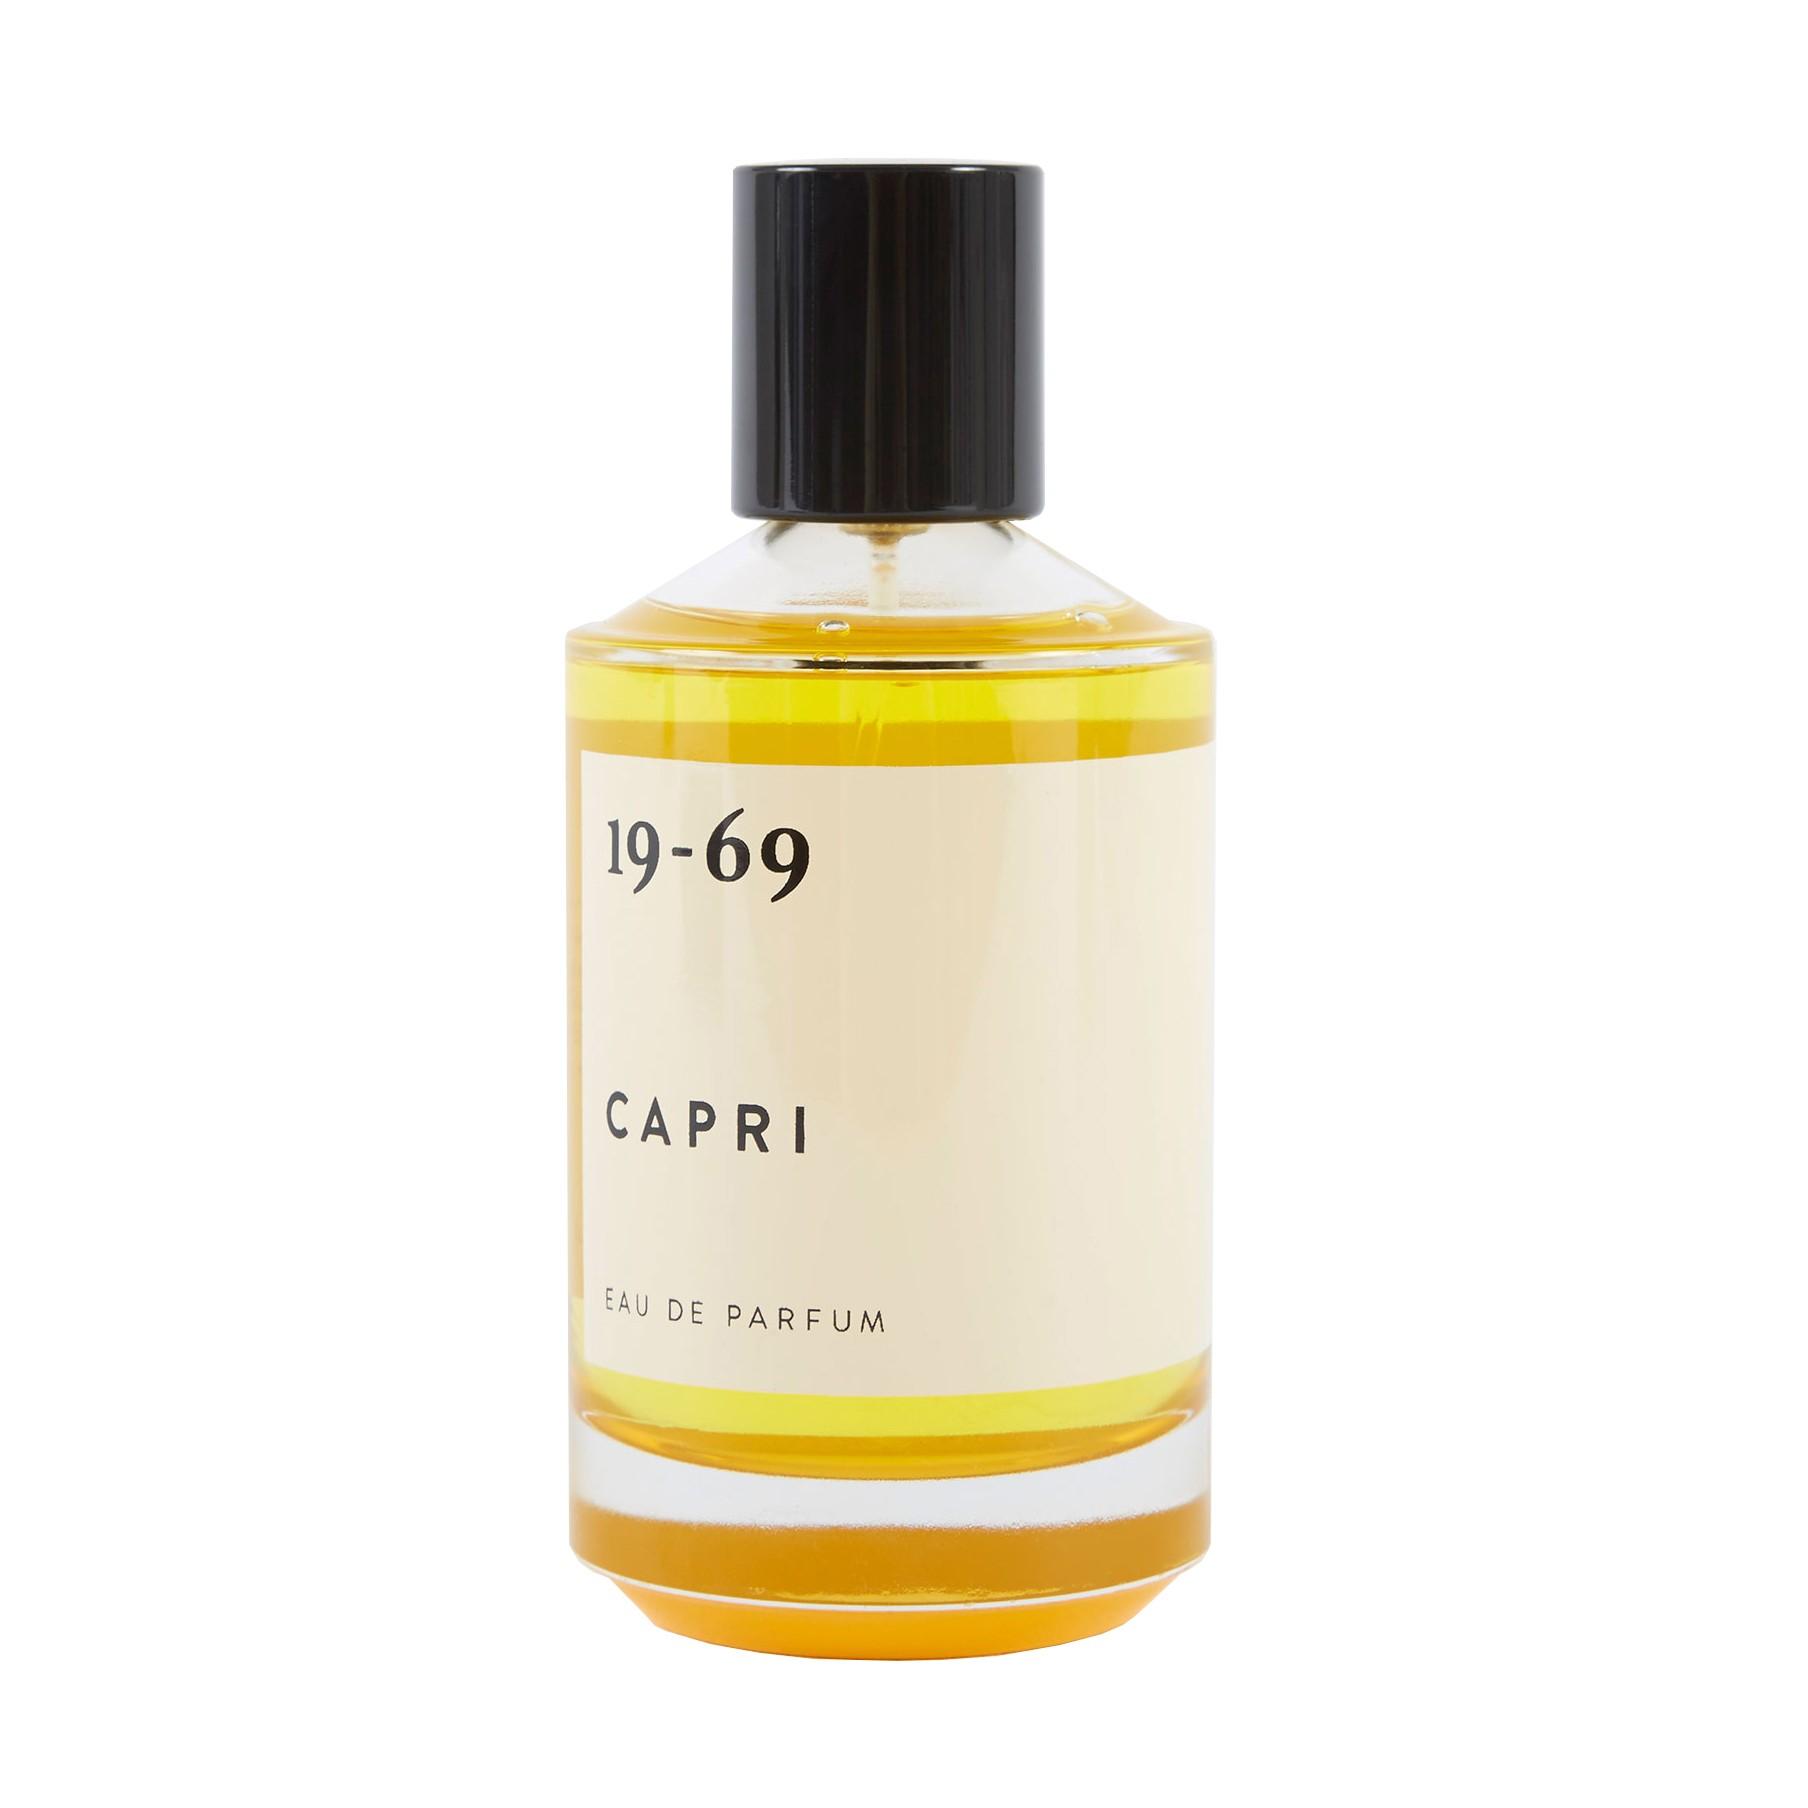 19-69 Capri аромат для мужчин и женщин